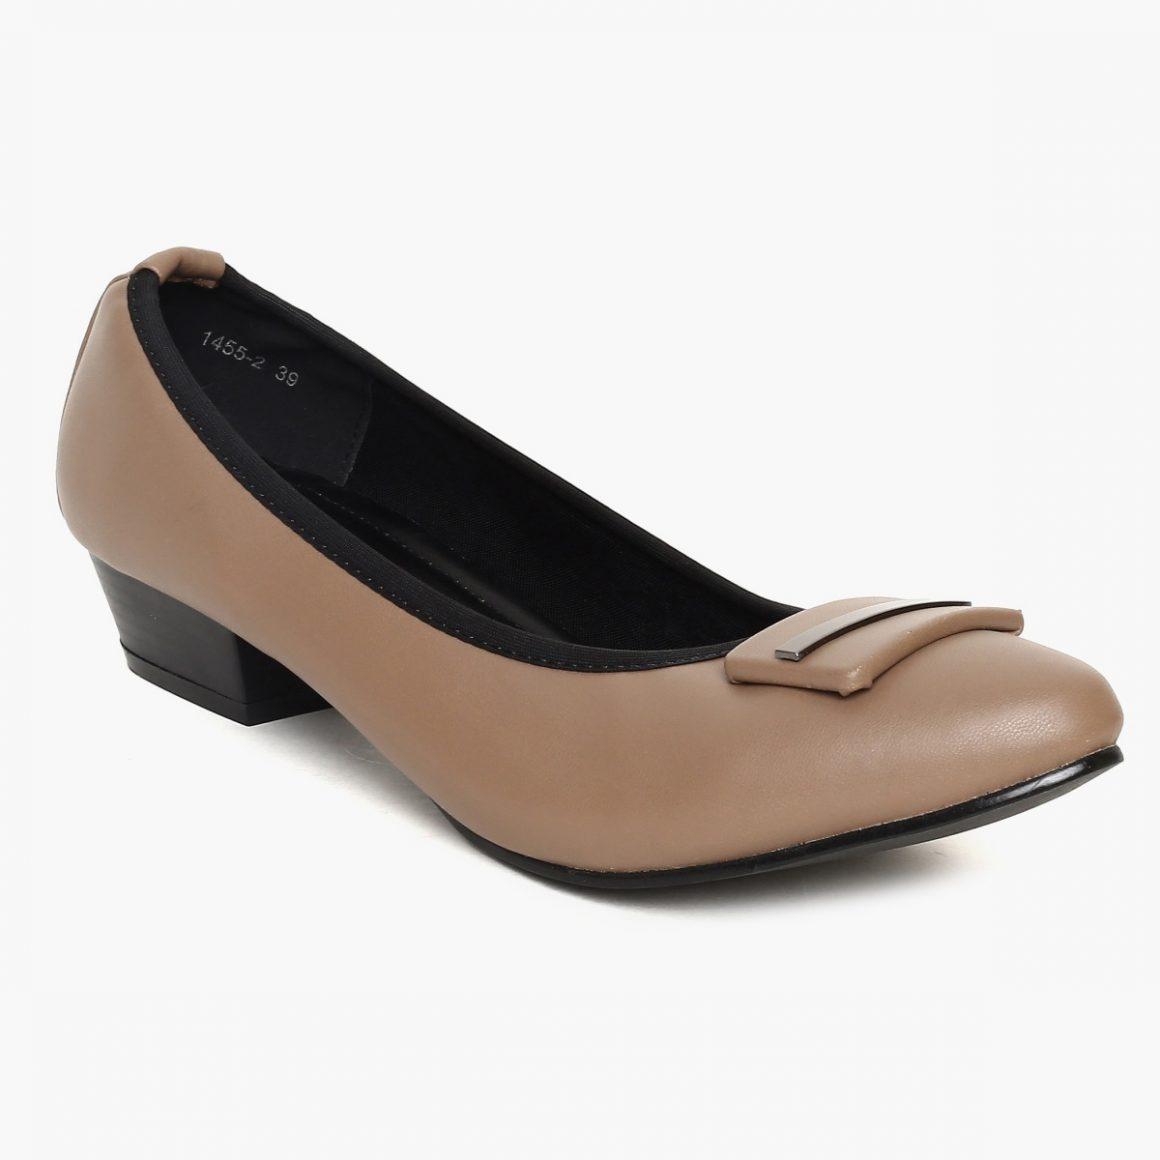 TRESMODE Metallic Detail Pointy Toed Kitten Heels